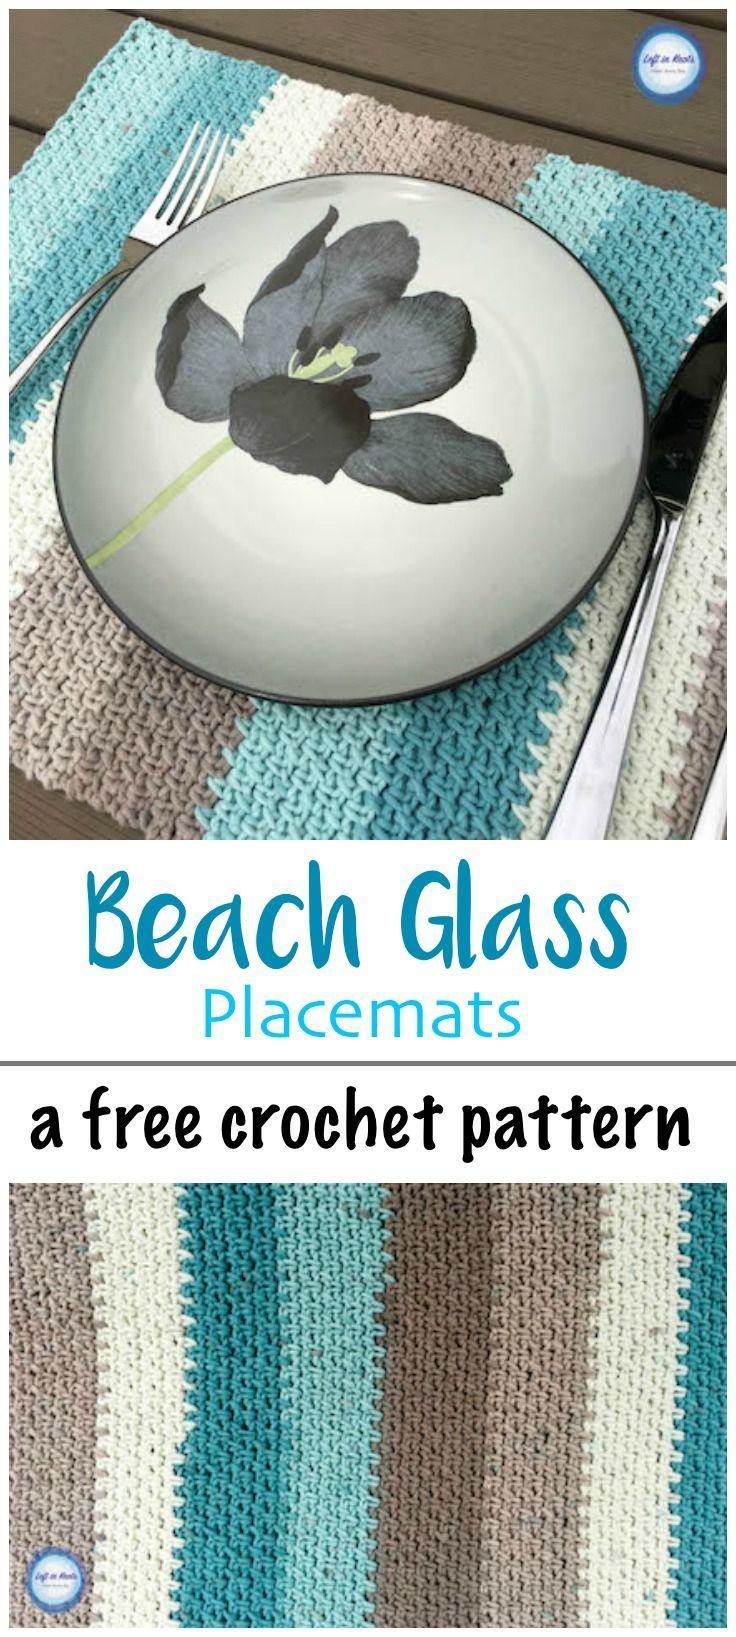 Crochet Beach Glass Placemats Left In Knots Crochet Placemat Patterns Crochet Coasters Placemats Patterns